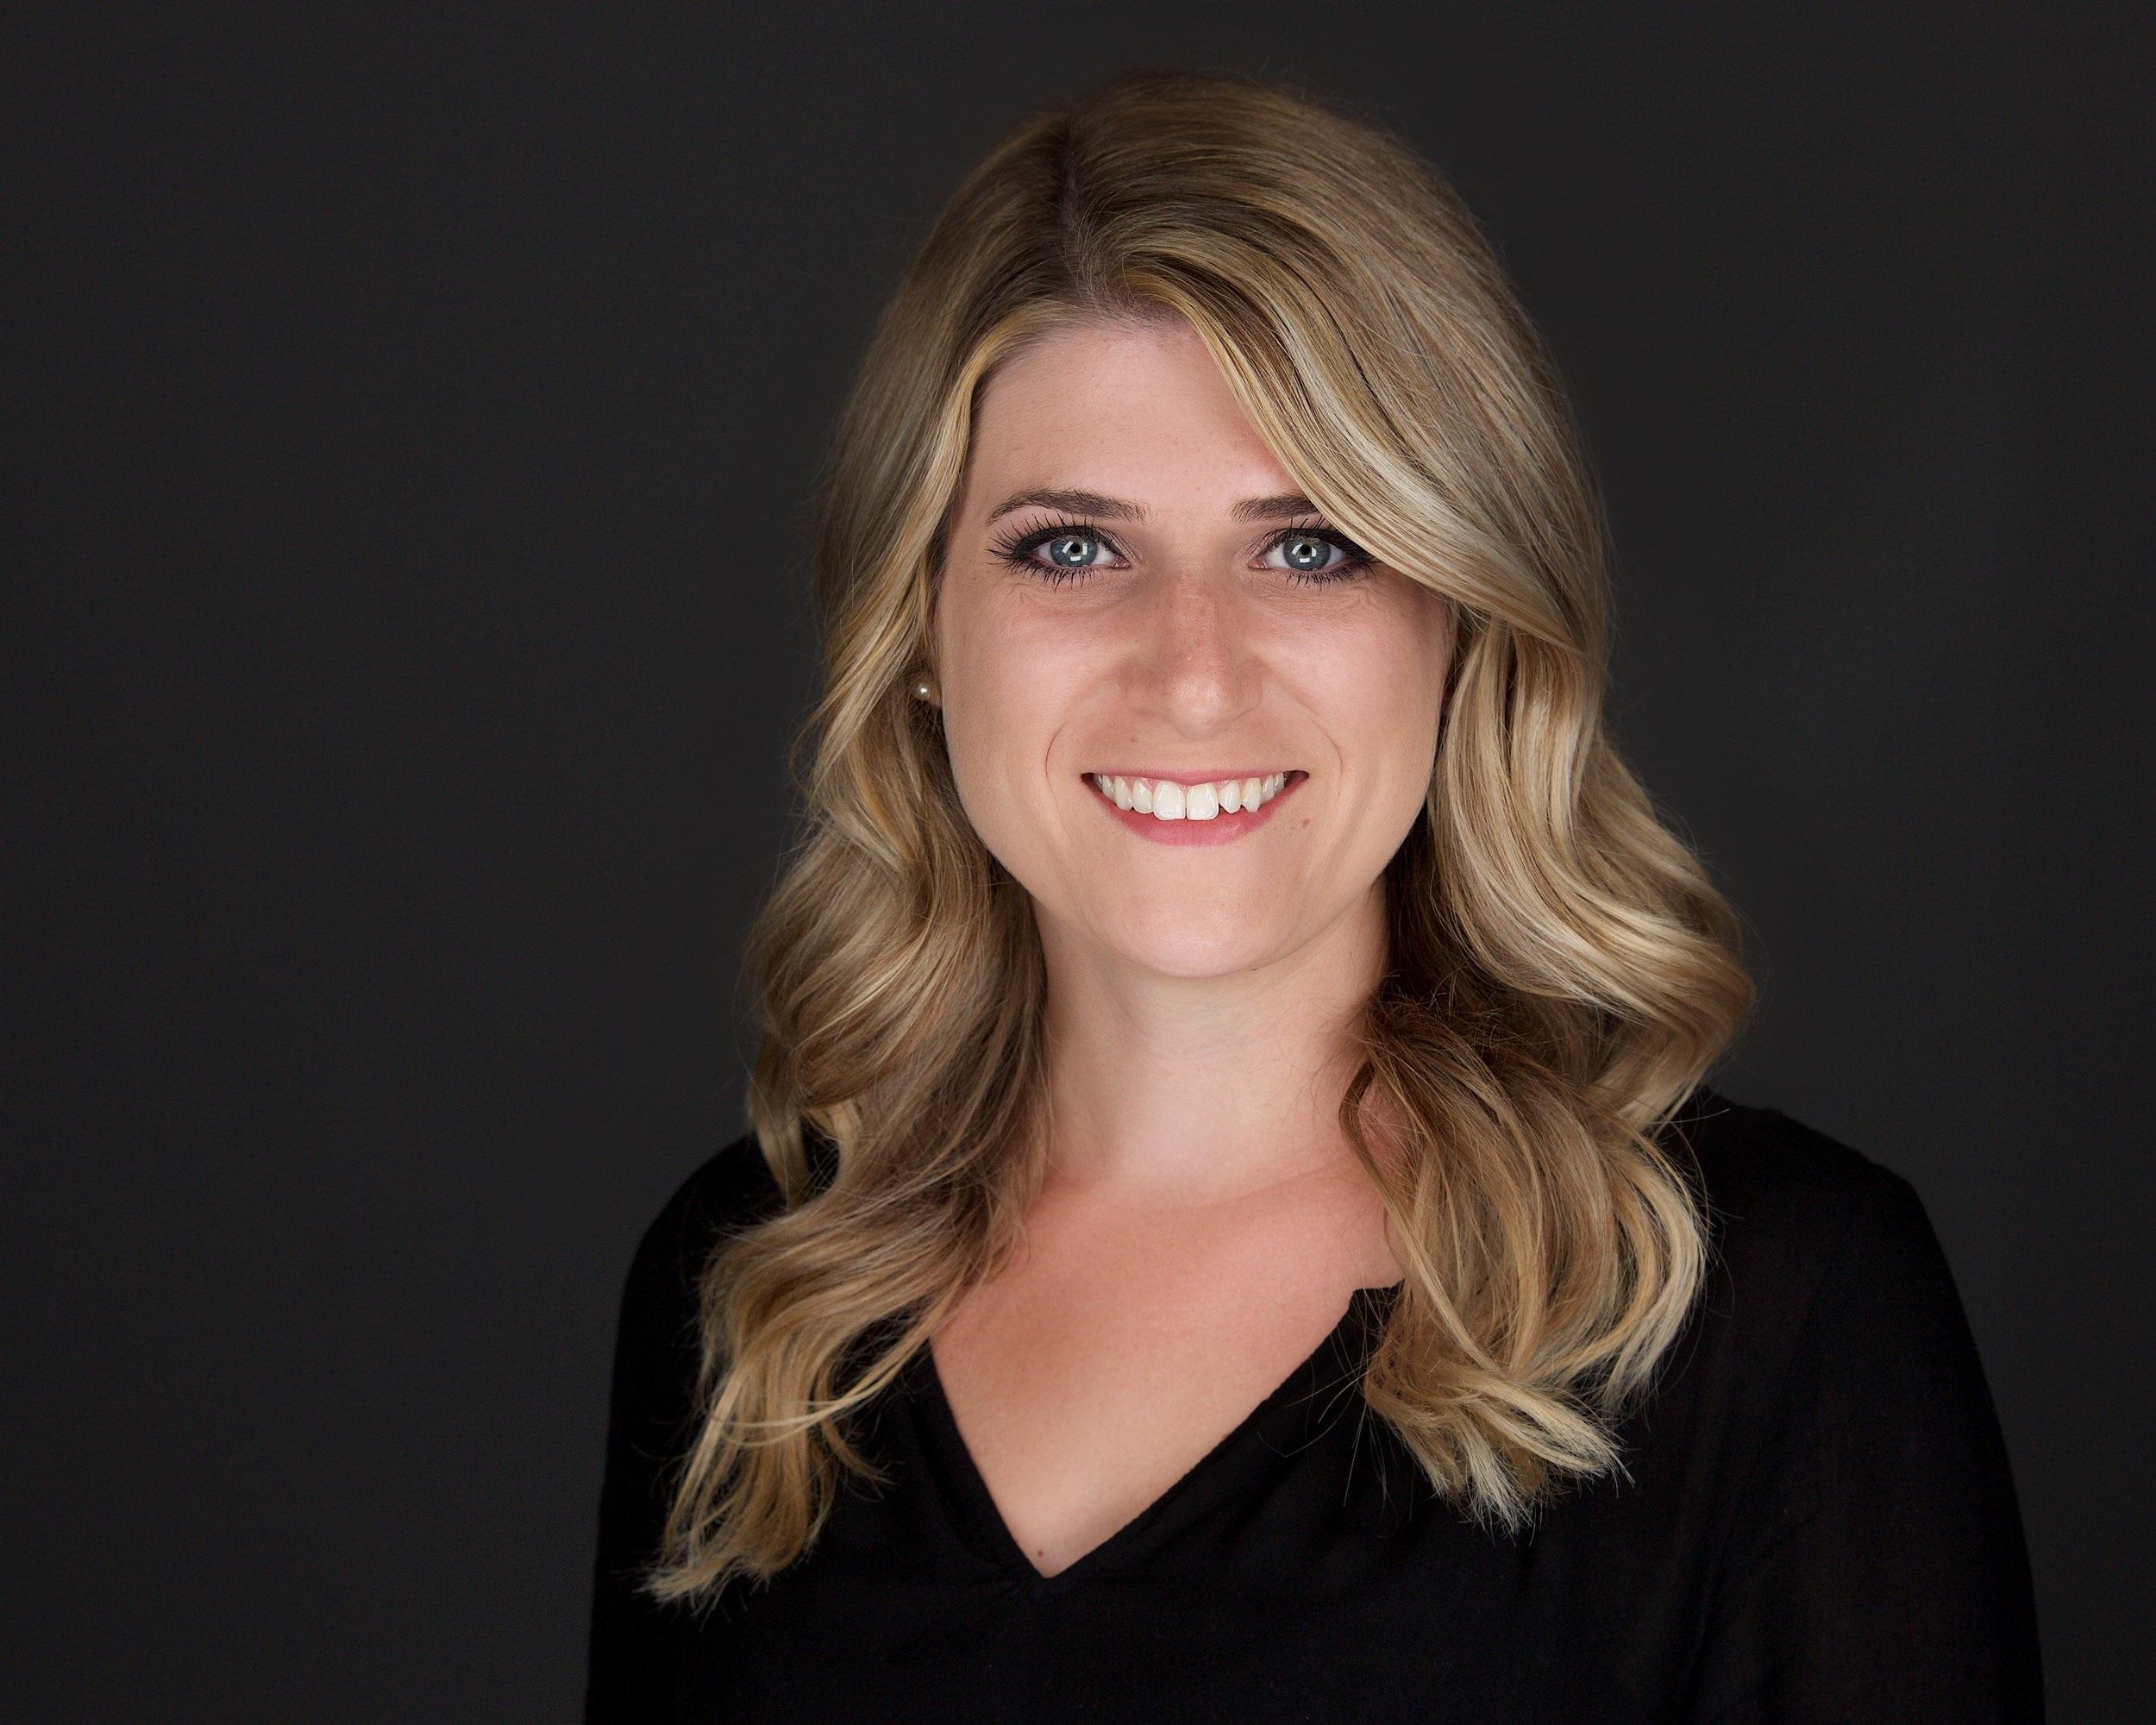 Stephanie Mettler - COORDINATING PRODUCER